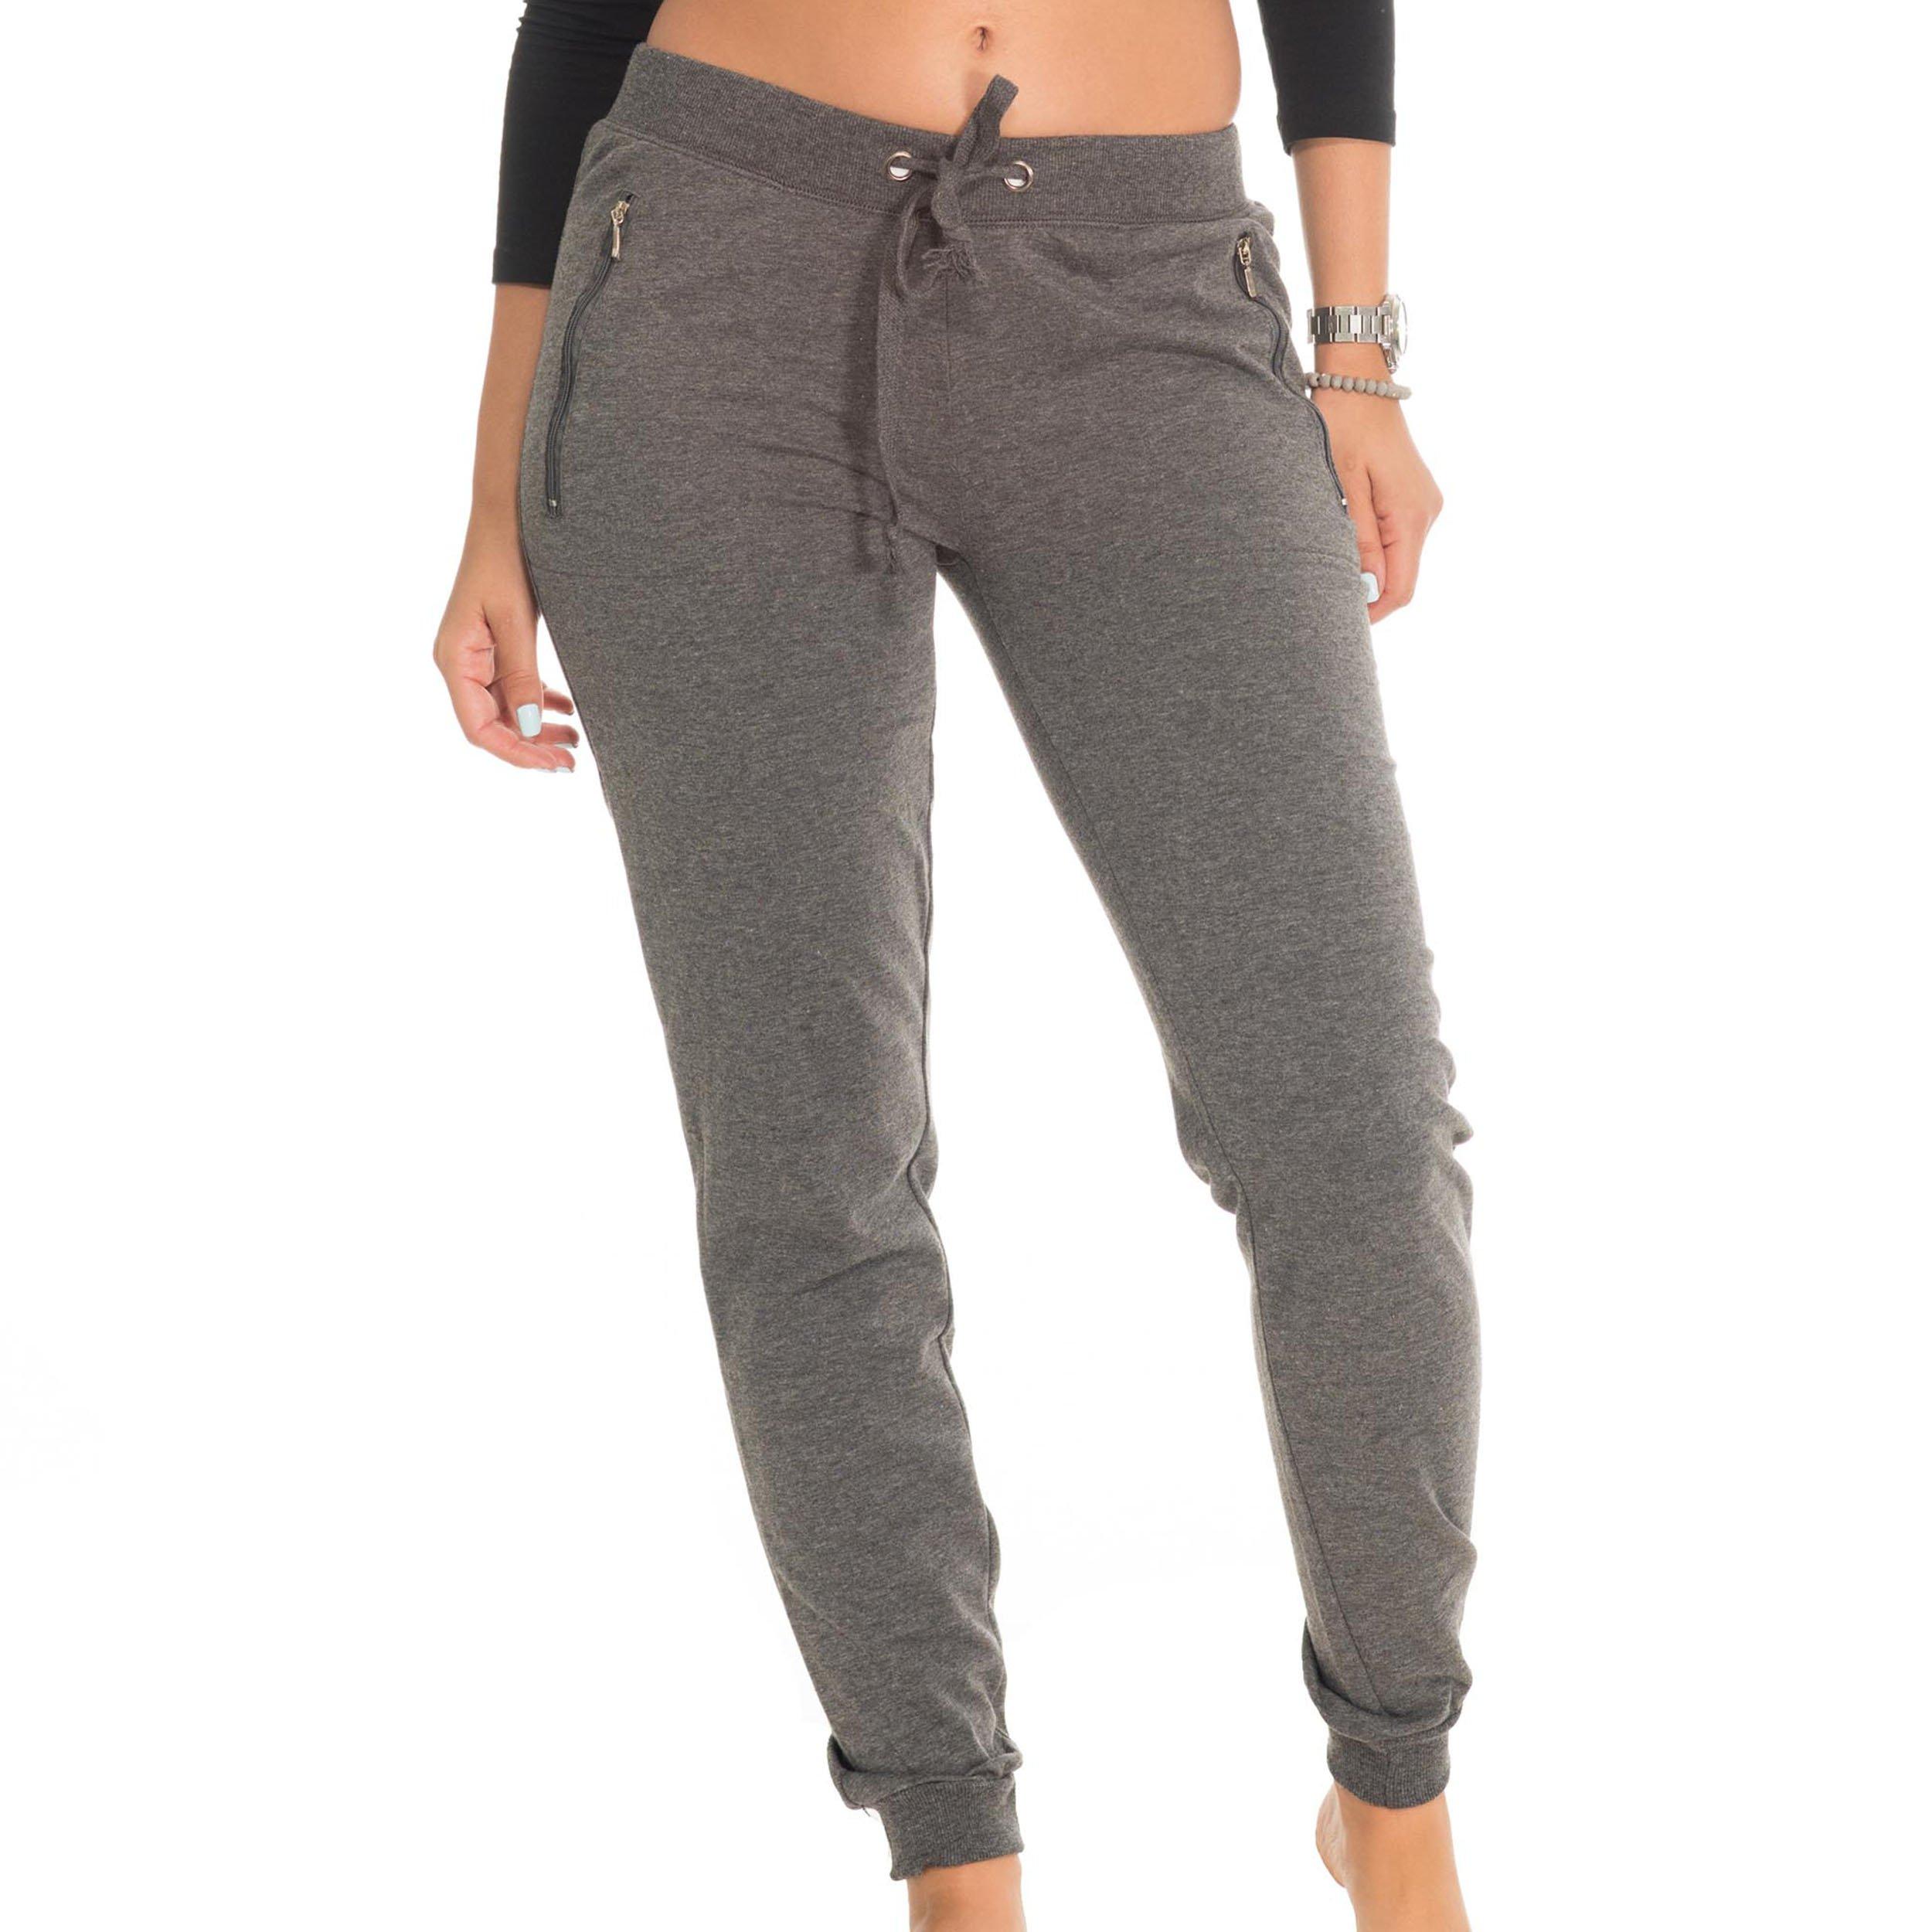 Coco-Limon Sweatpants For Women - Long, Fleece, Drawstring Waist With Zipper Pockets,Heather Charcoal,Medium